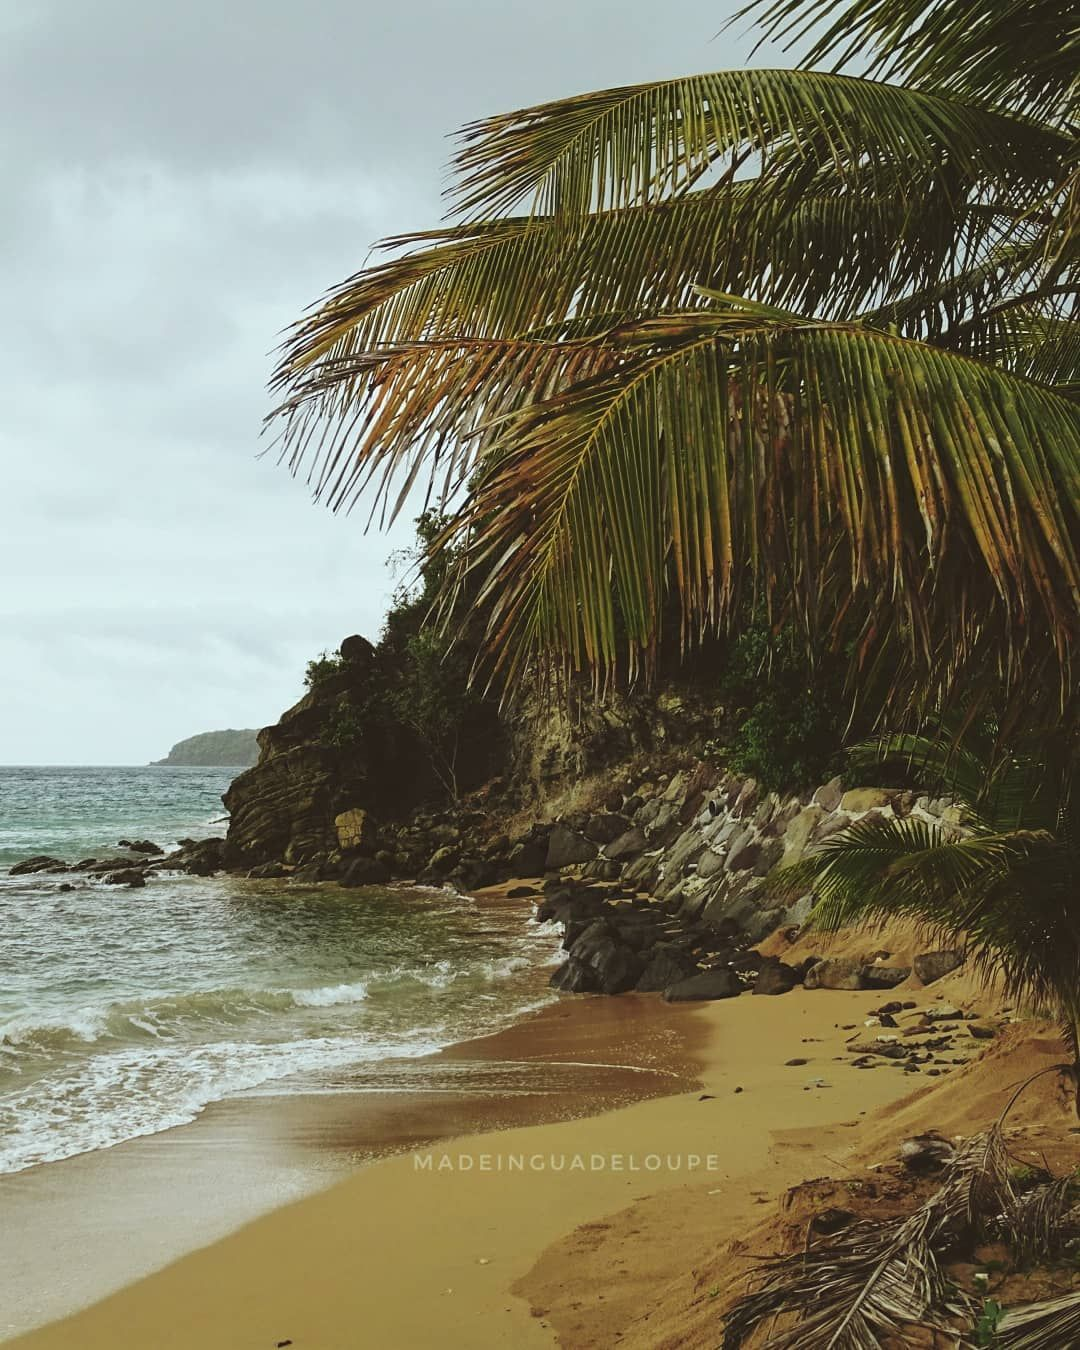 Guadeloupe Beach: So Peaceful... Guadeloupe 📍 🌴 (Caribbean